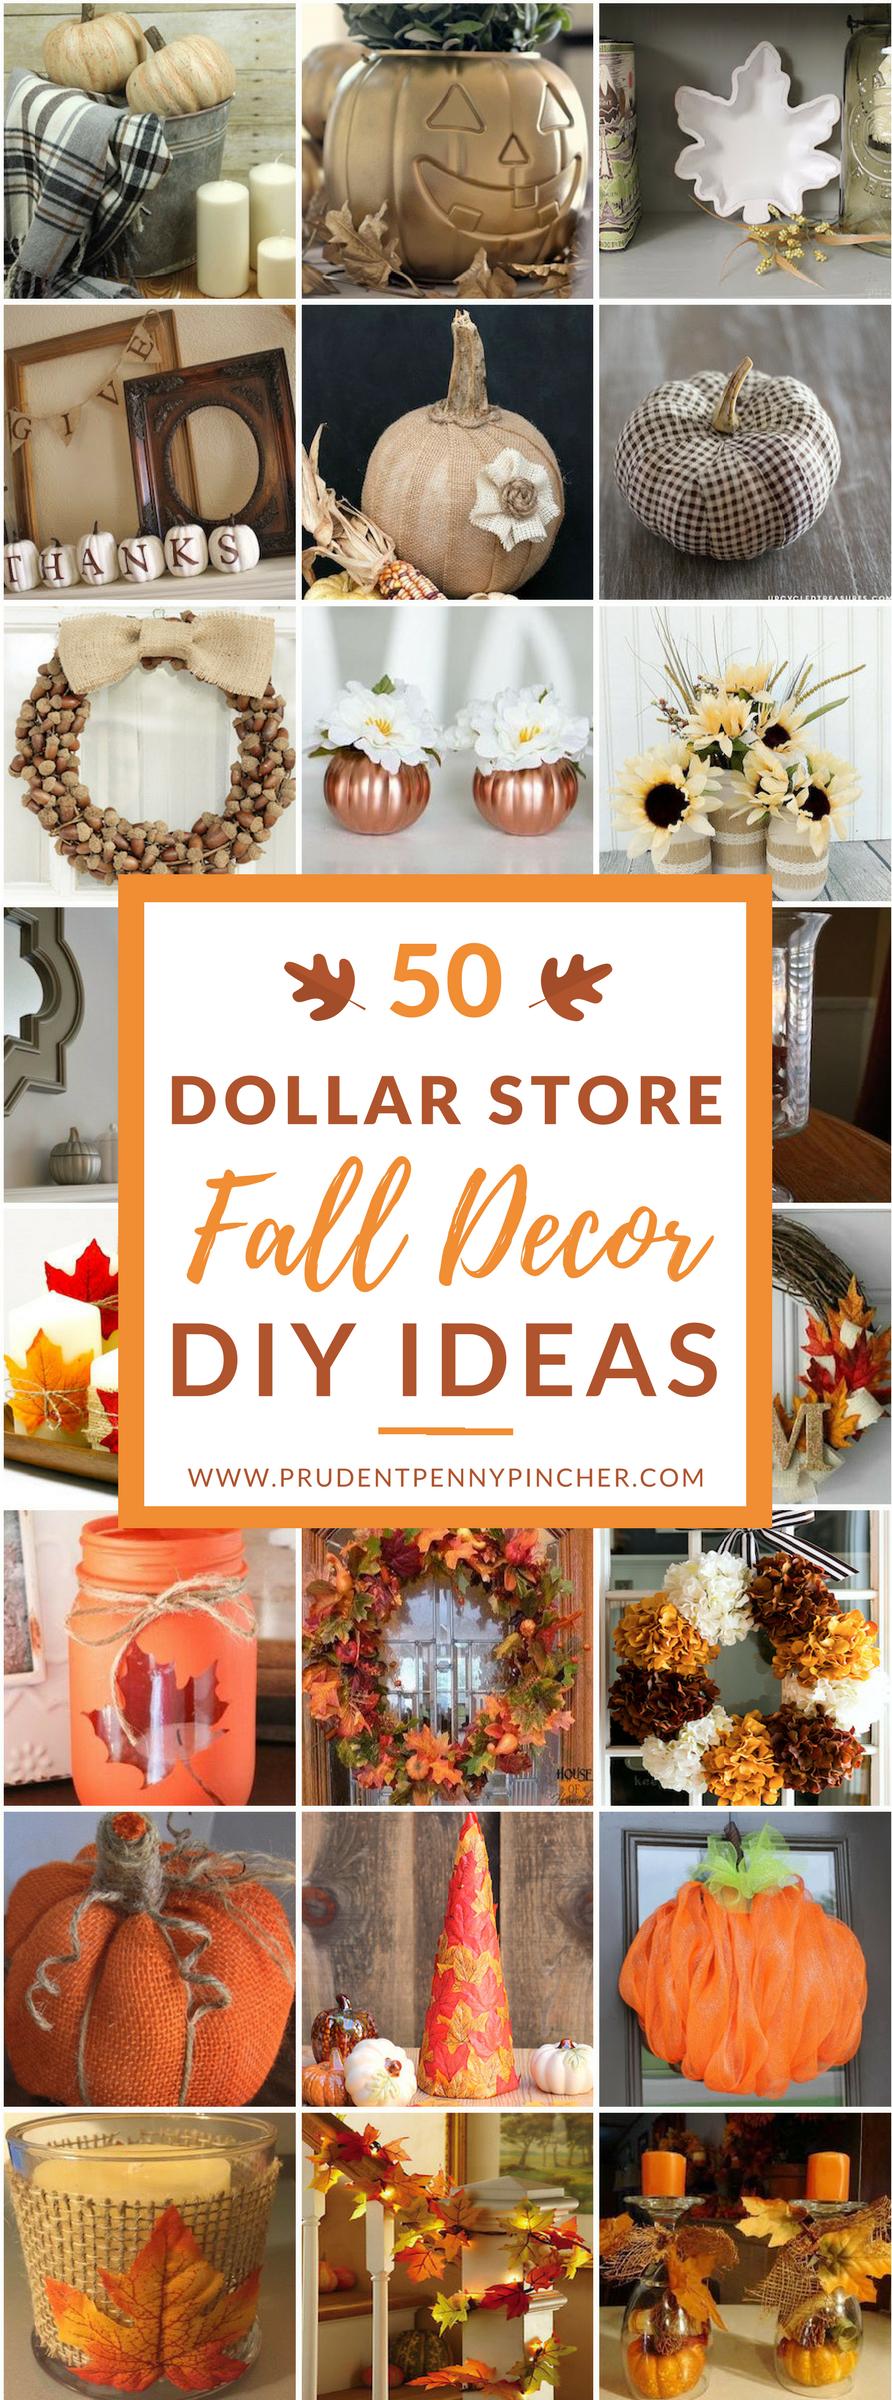 50 Dollar Store Fall Decor DIY Ideas | Dollar stores, DIY ideas ...